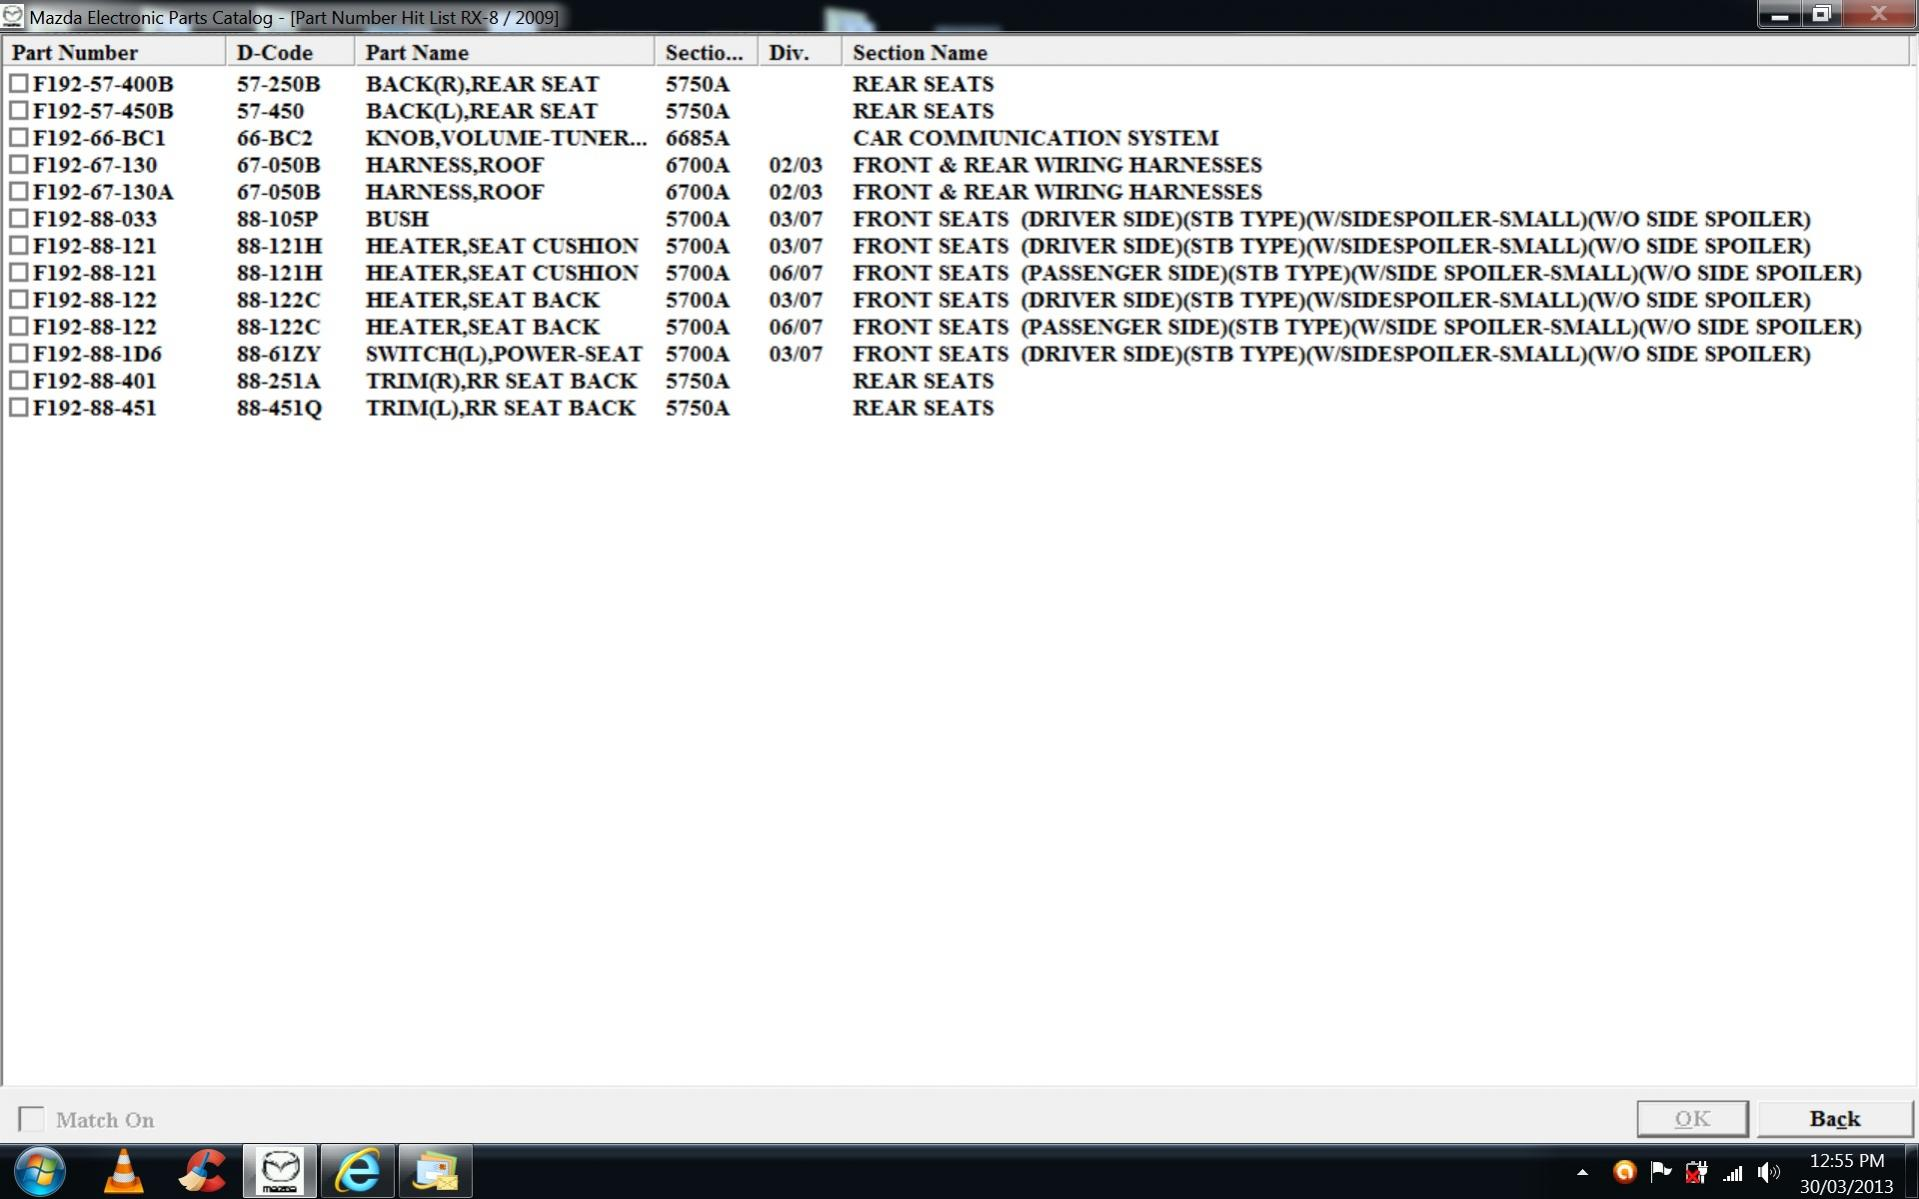 Series II Mazda OE Parts Number Listings- Complete